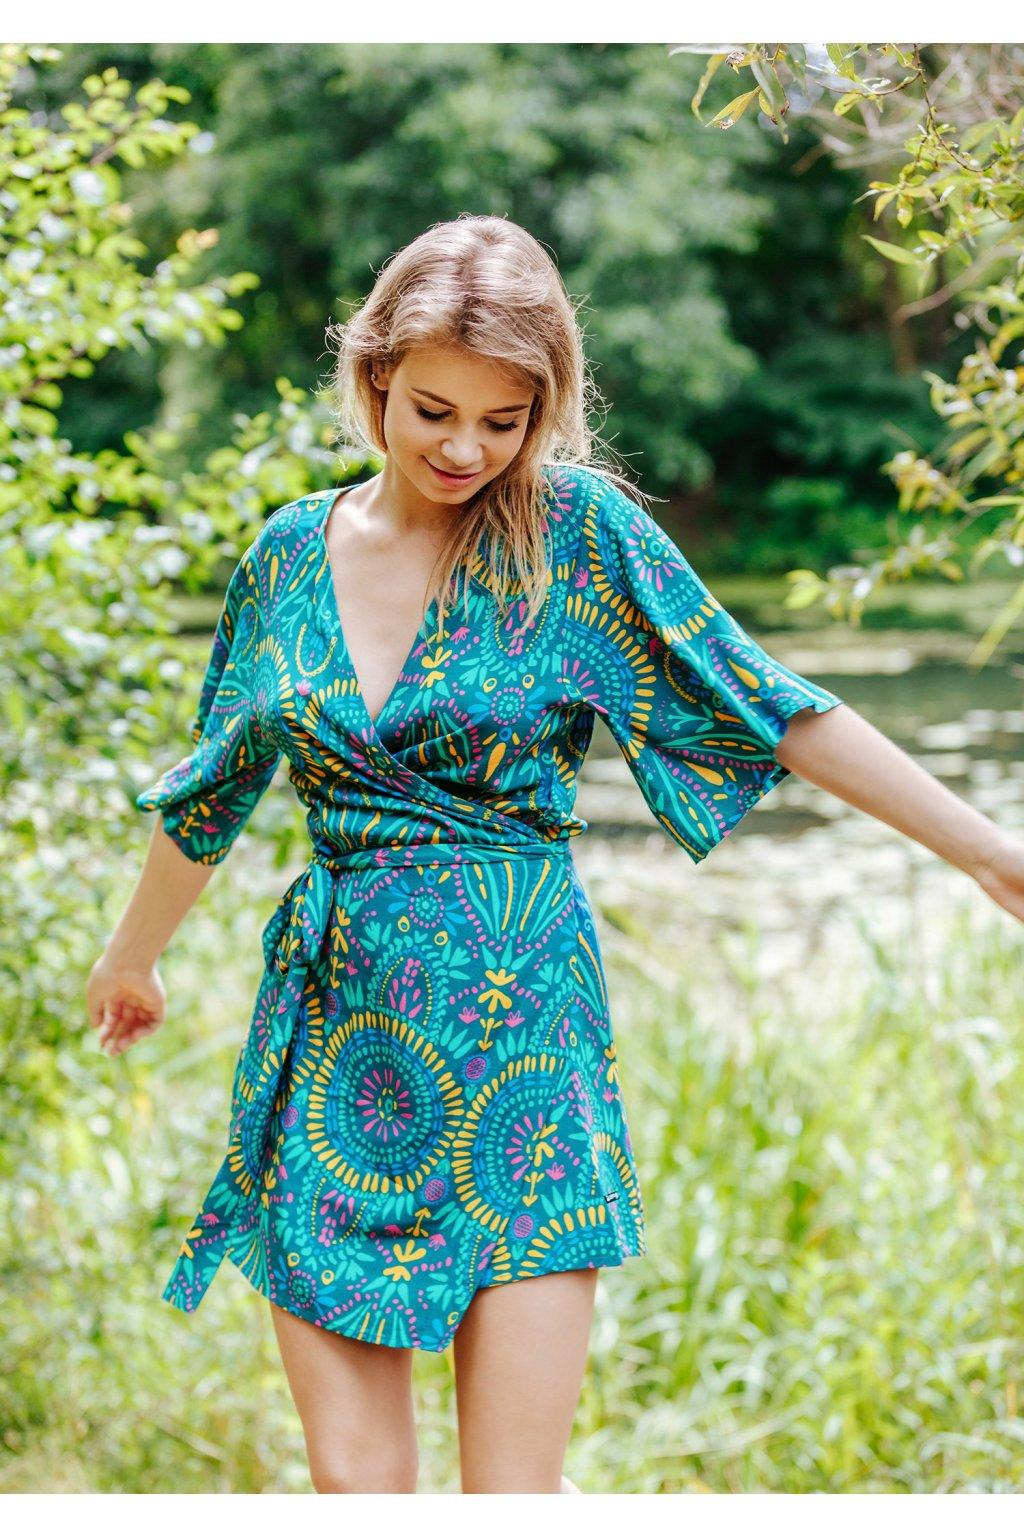 Lehké šaty - homewear z viskózy LHD 905